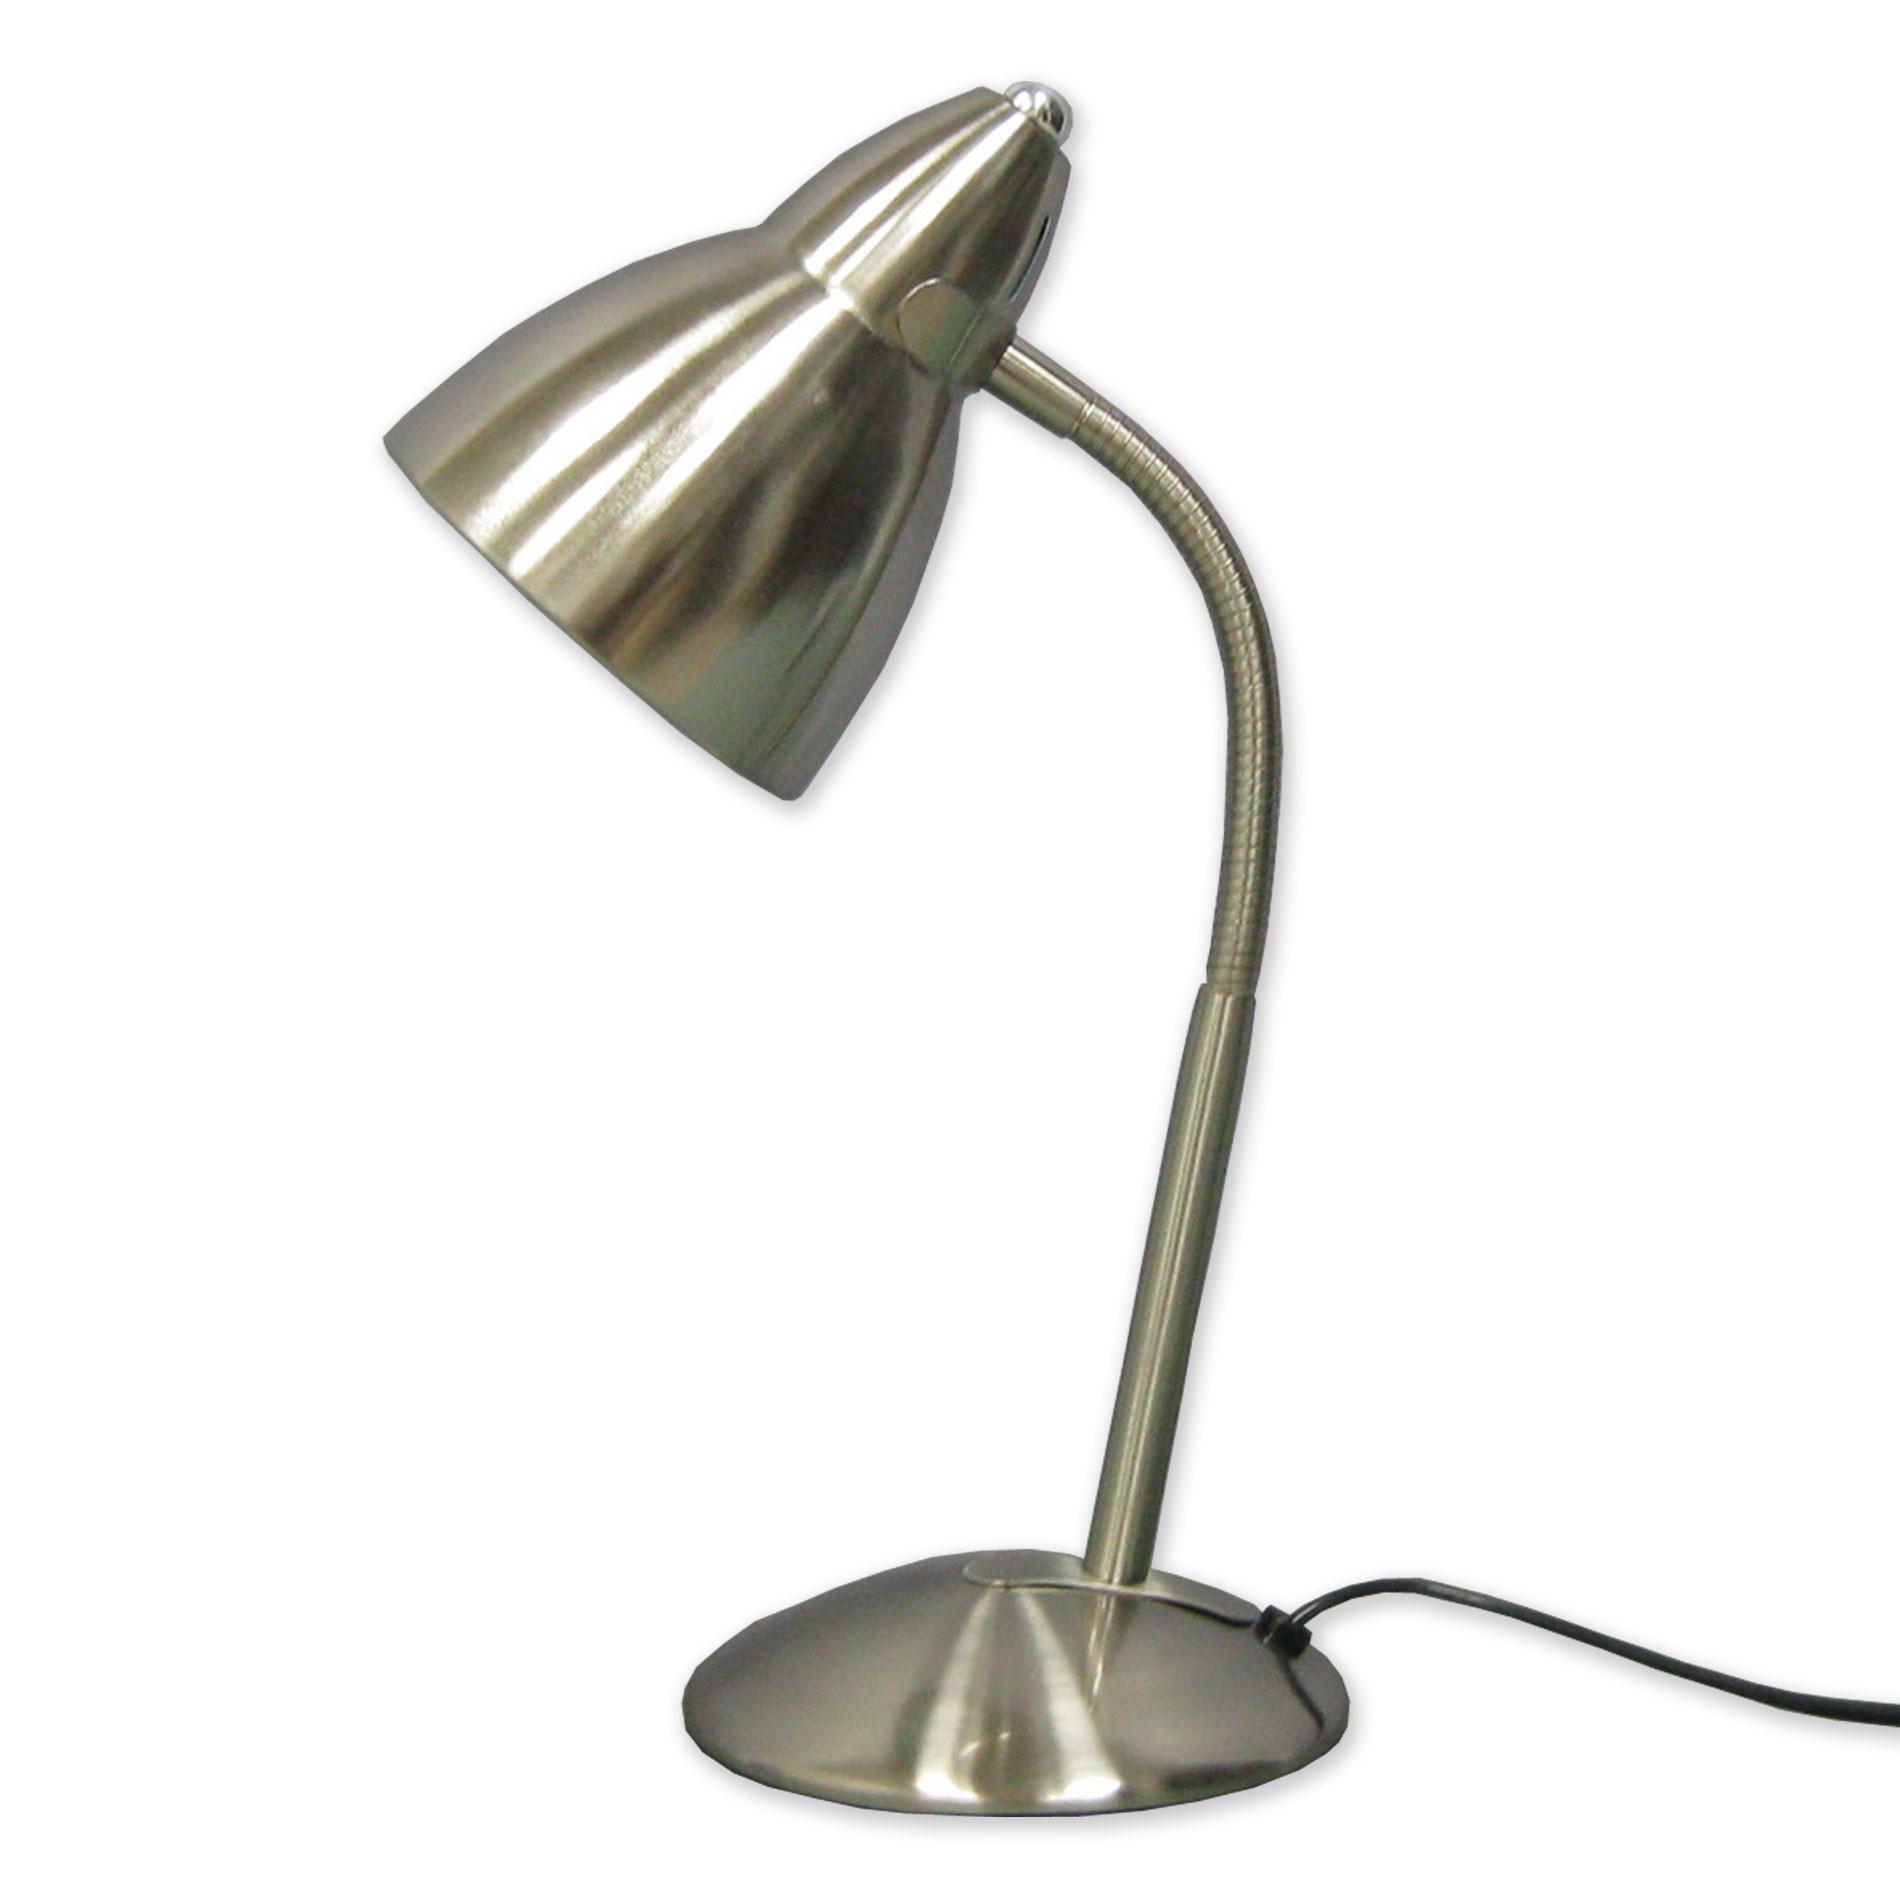 Best ideas about Gooseneck Desk Lamps . Save or Pin Essential Home Gooseneck Desk Lamp – Silver Now.